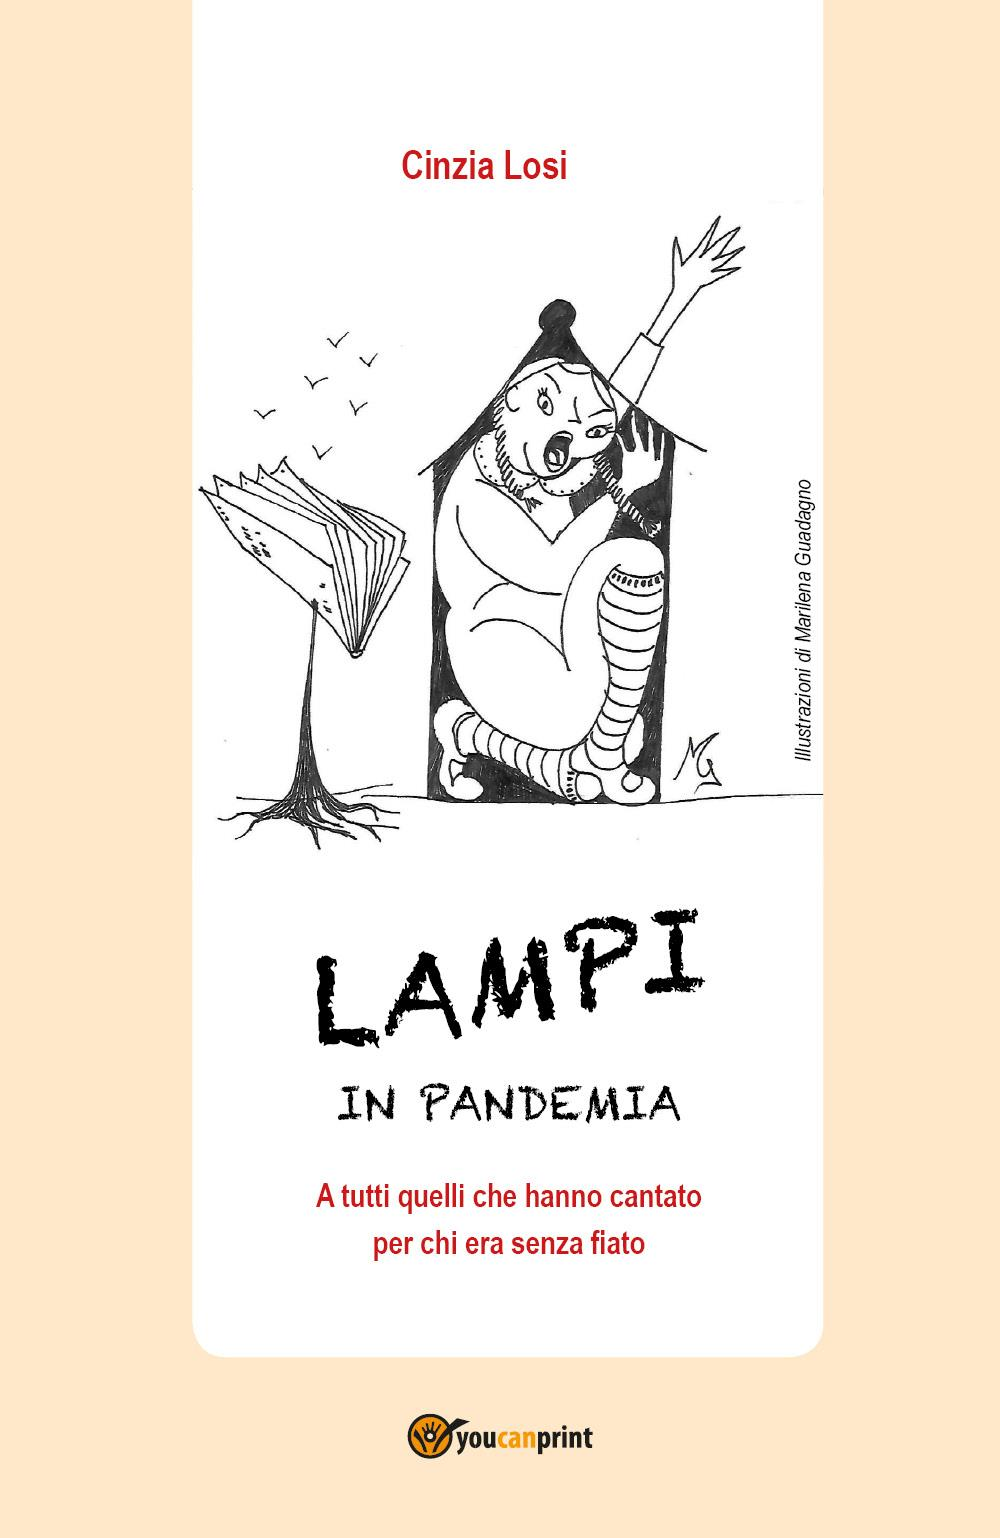 Lampi in pandemia